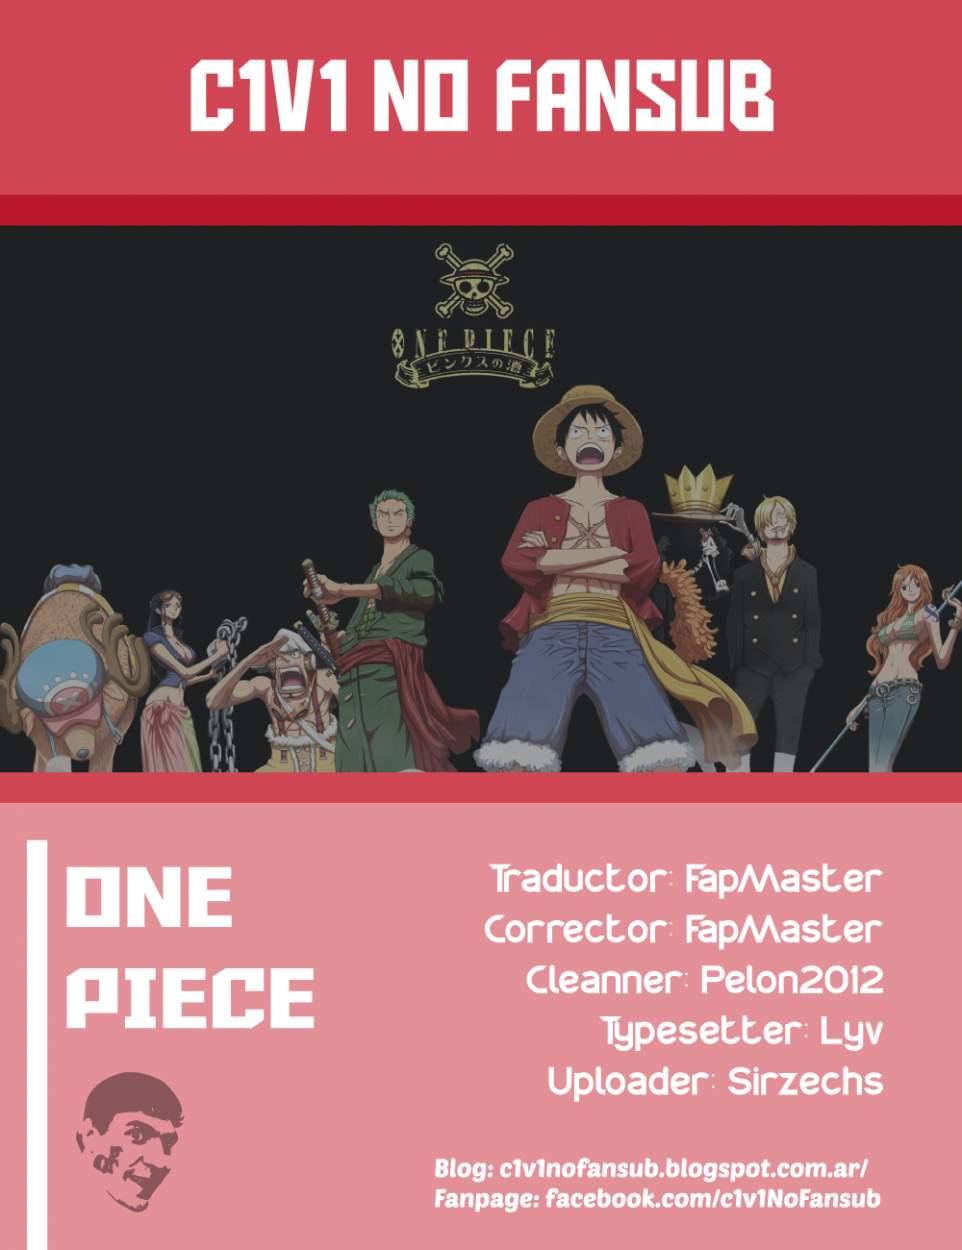 http://c5.ninemanga.com/es_manga/50/114/378390/378390_1_602.jpg Page 1